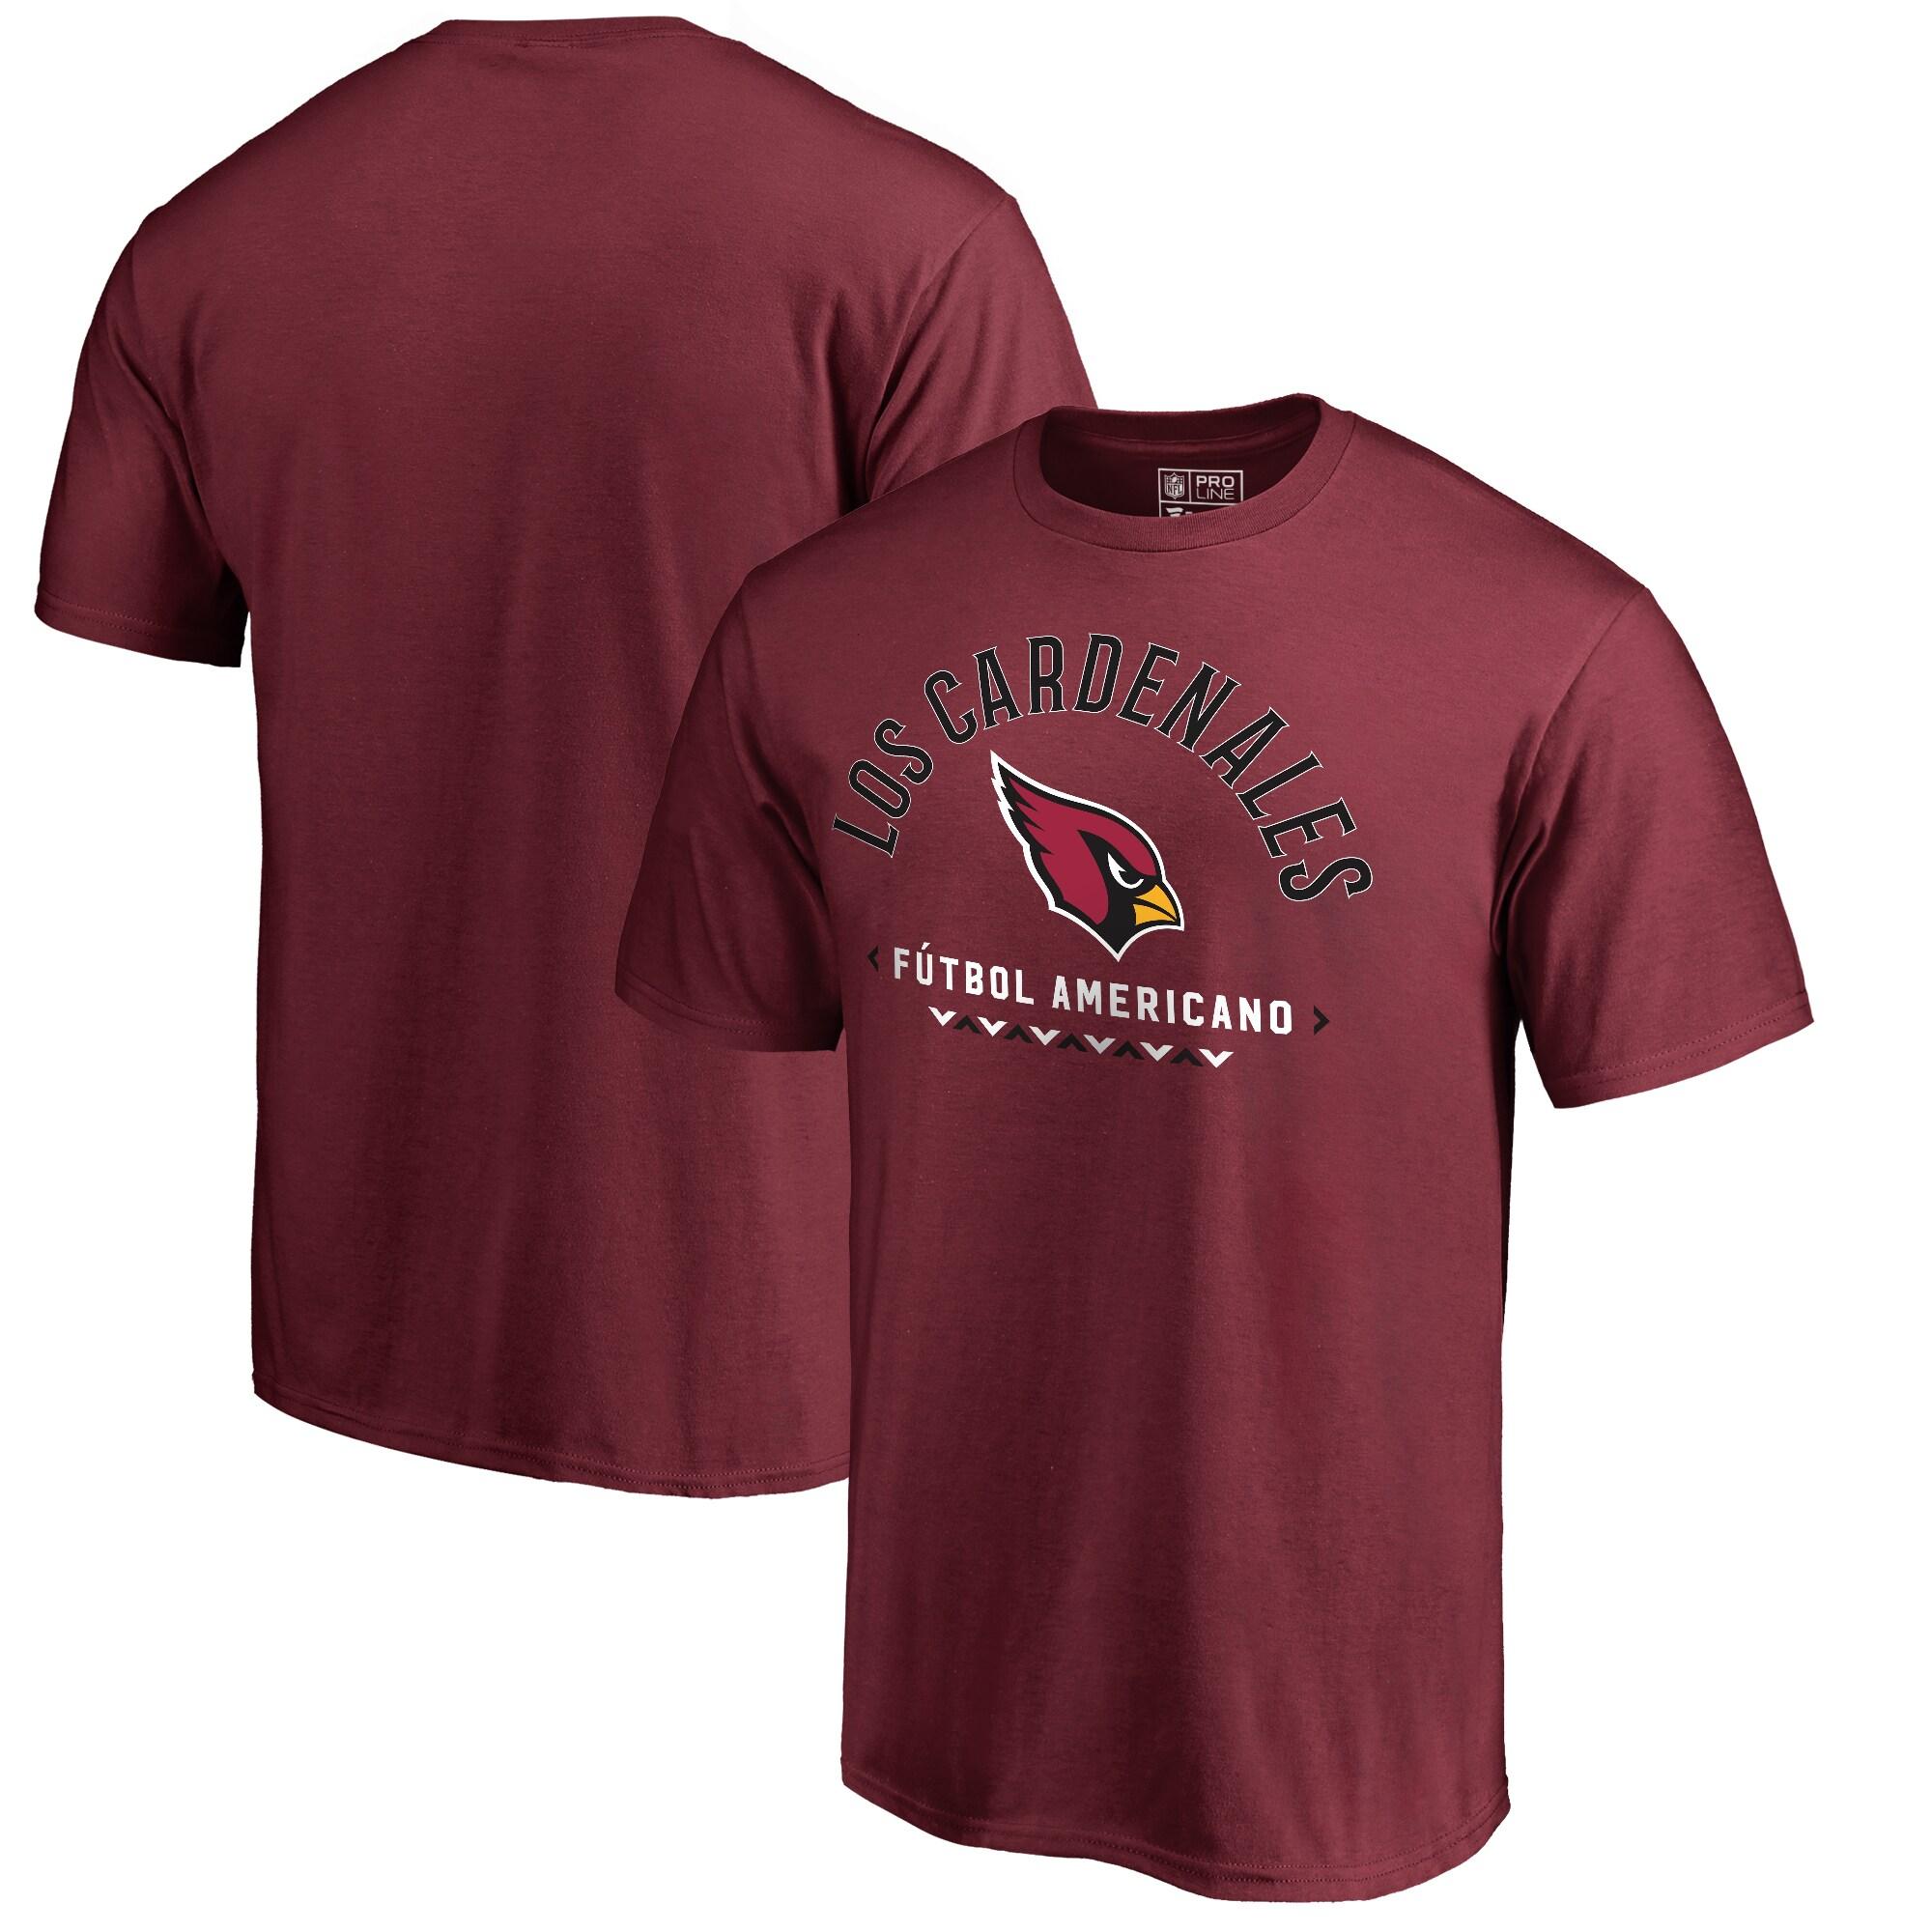 Arizona Cardinals NFL Pro Line by Fanatics Branded Futbol Americano T-Shirt - Cardinal